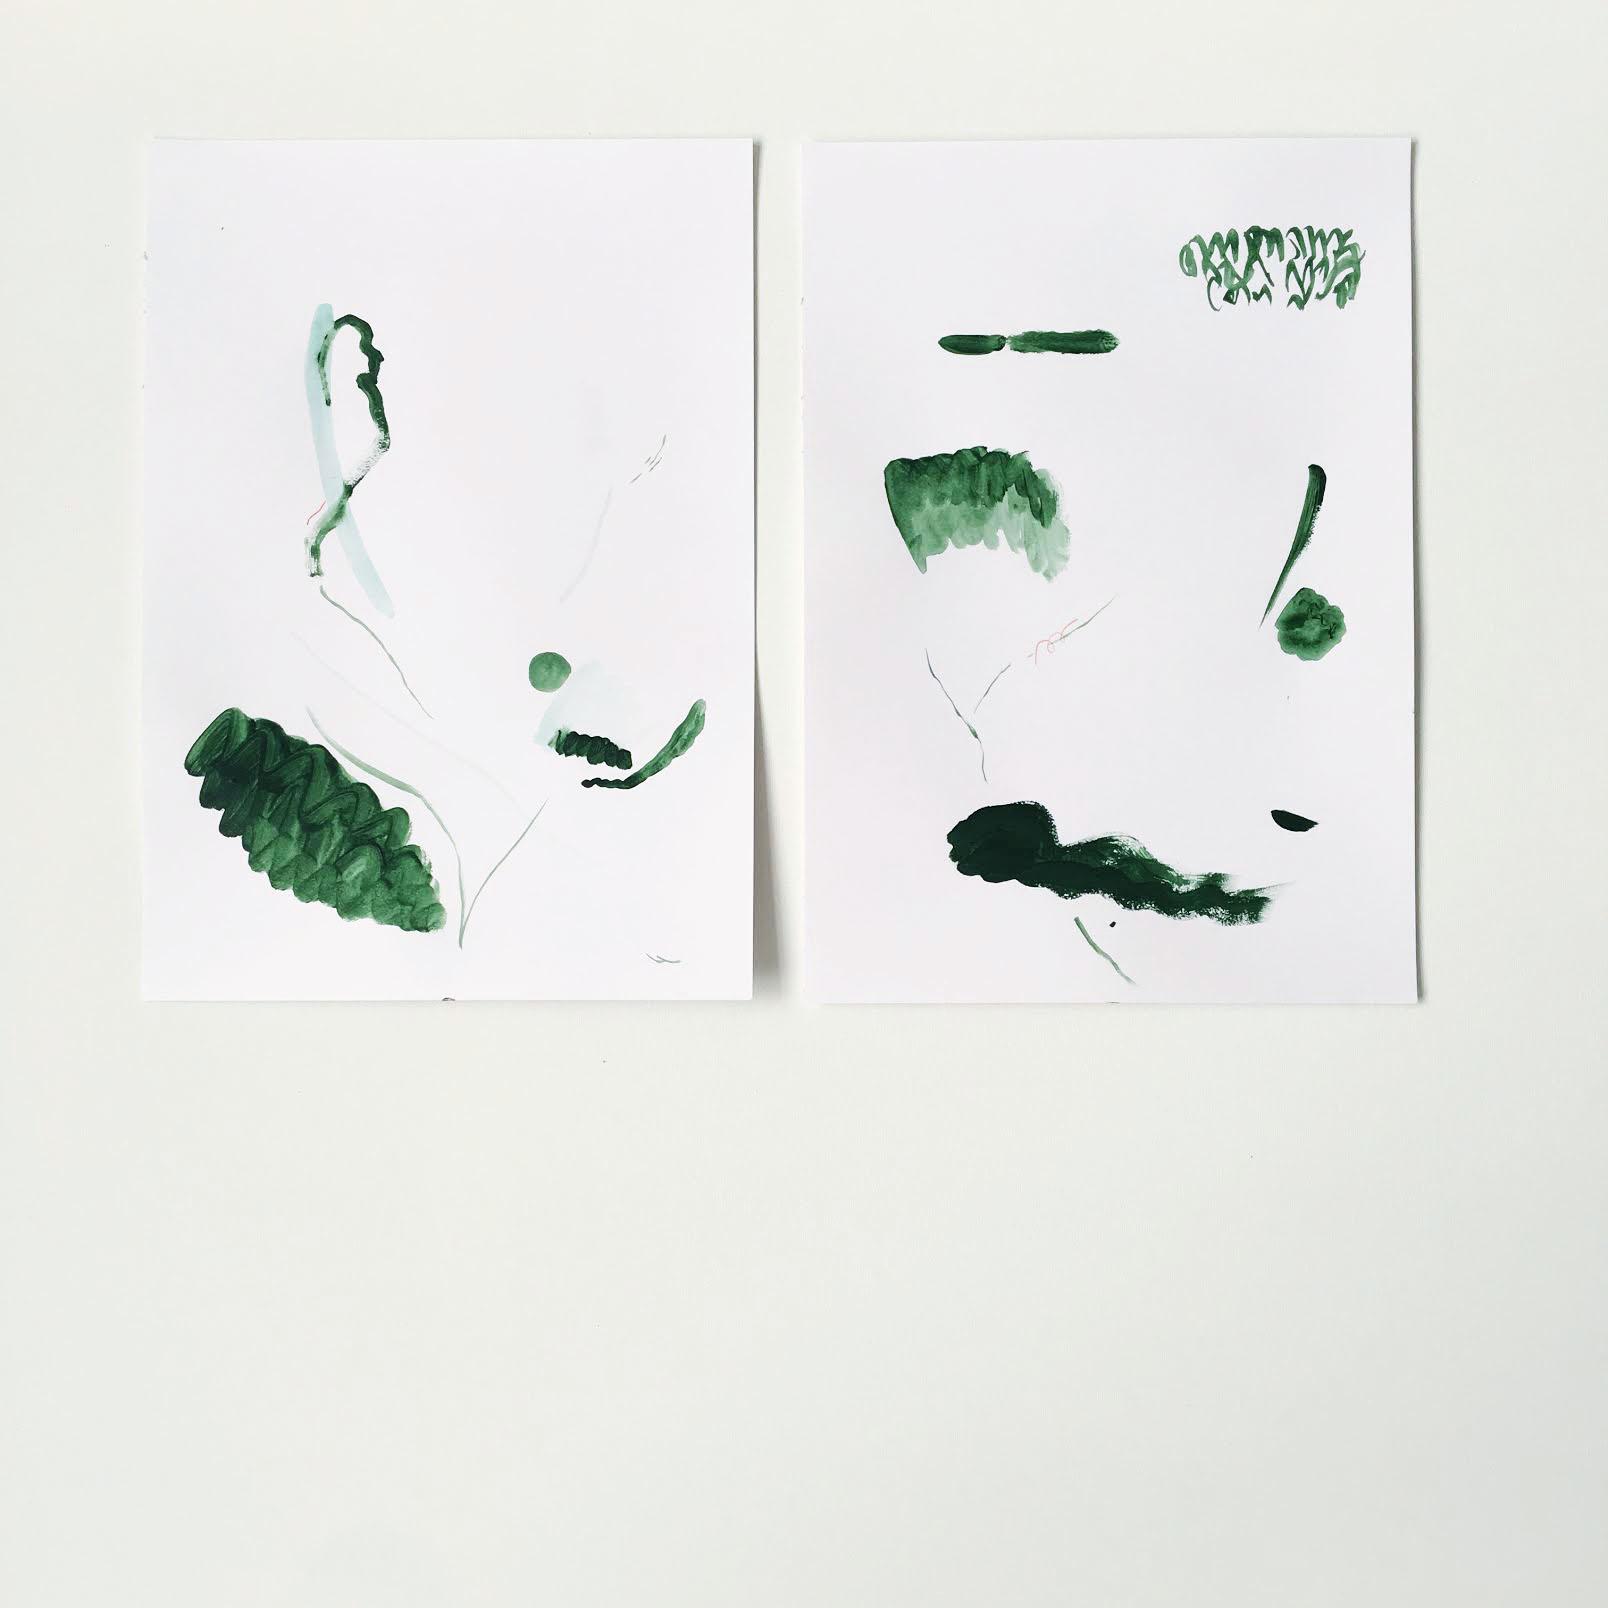 forest drawings1.jpg